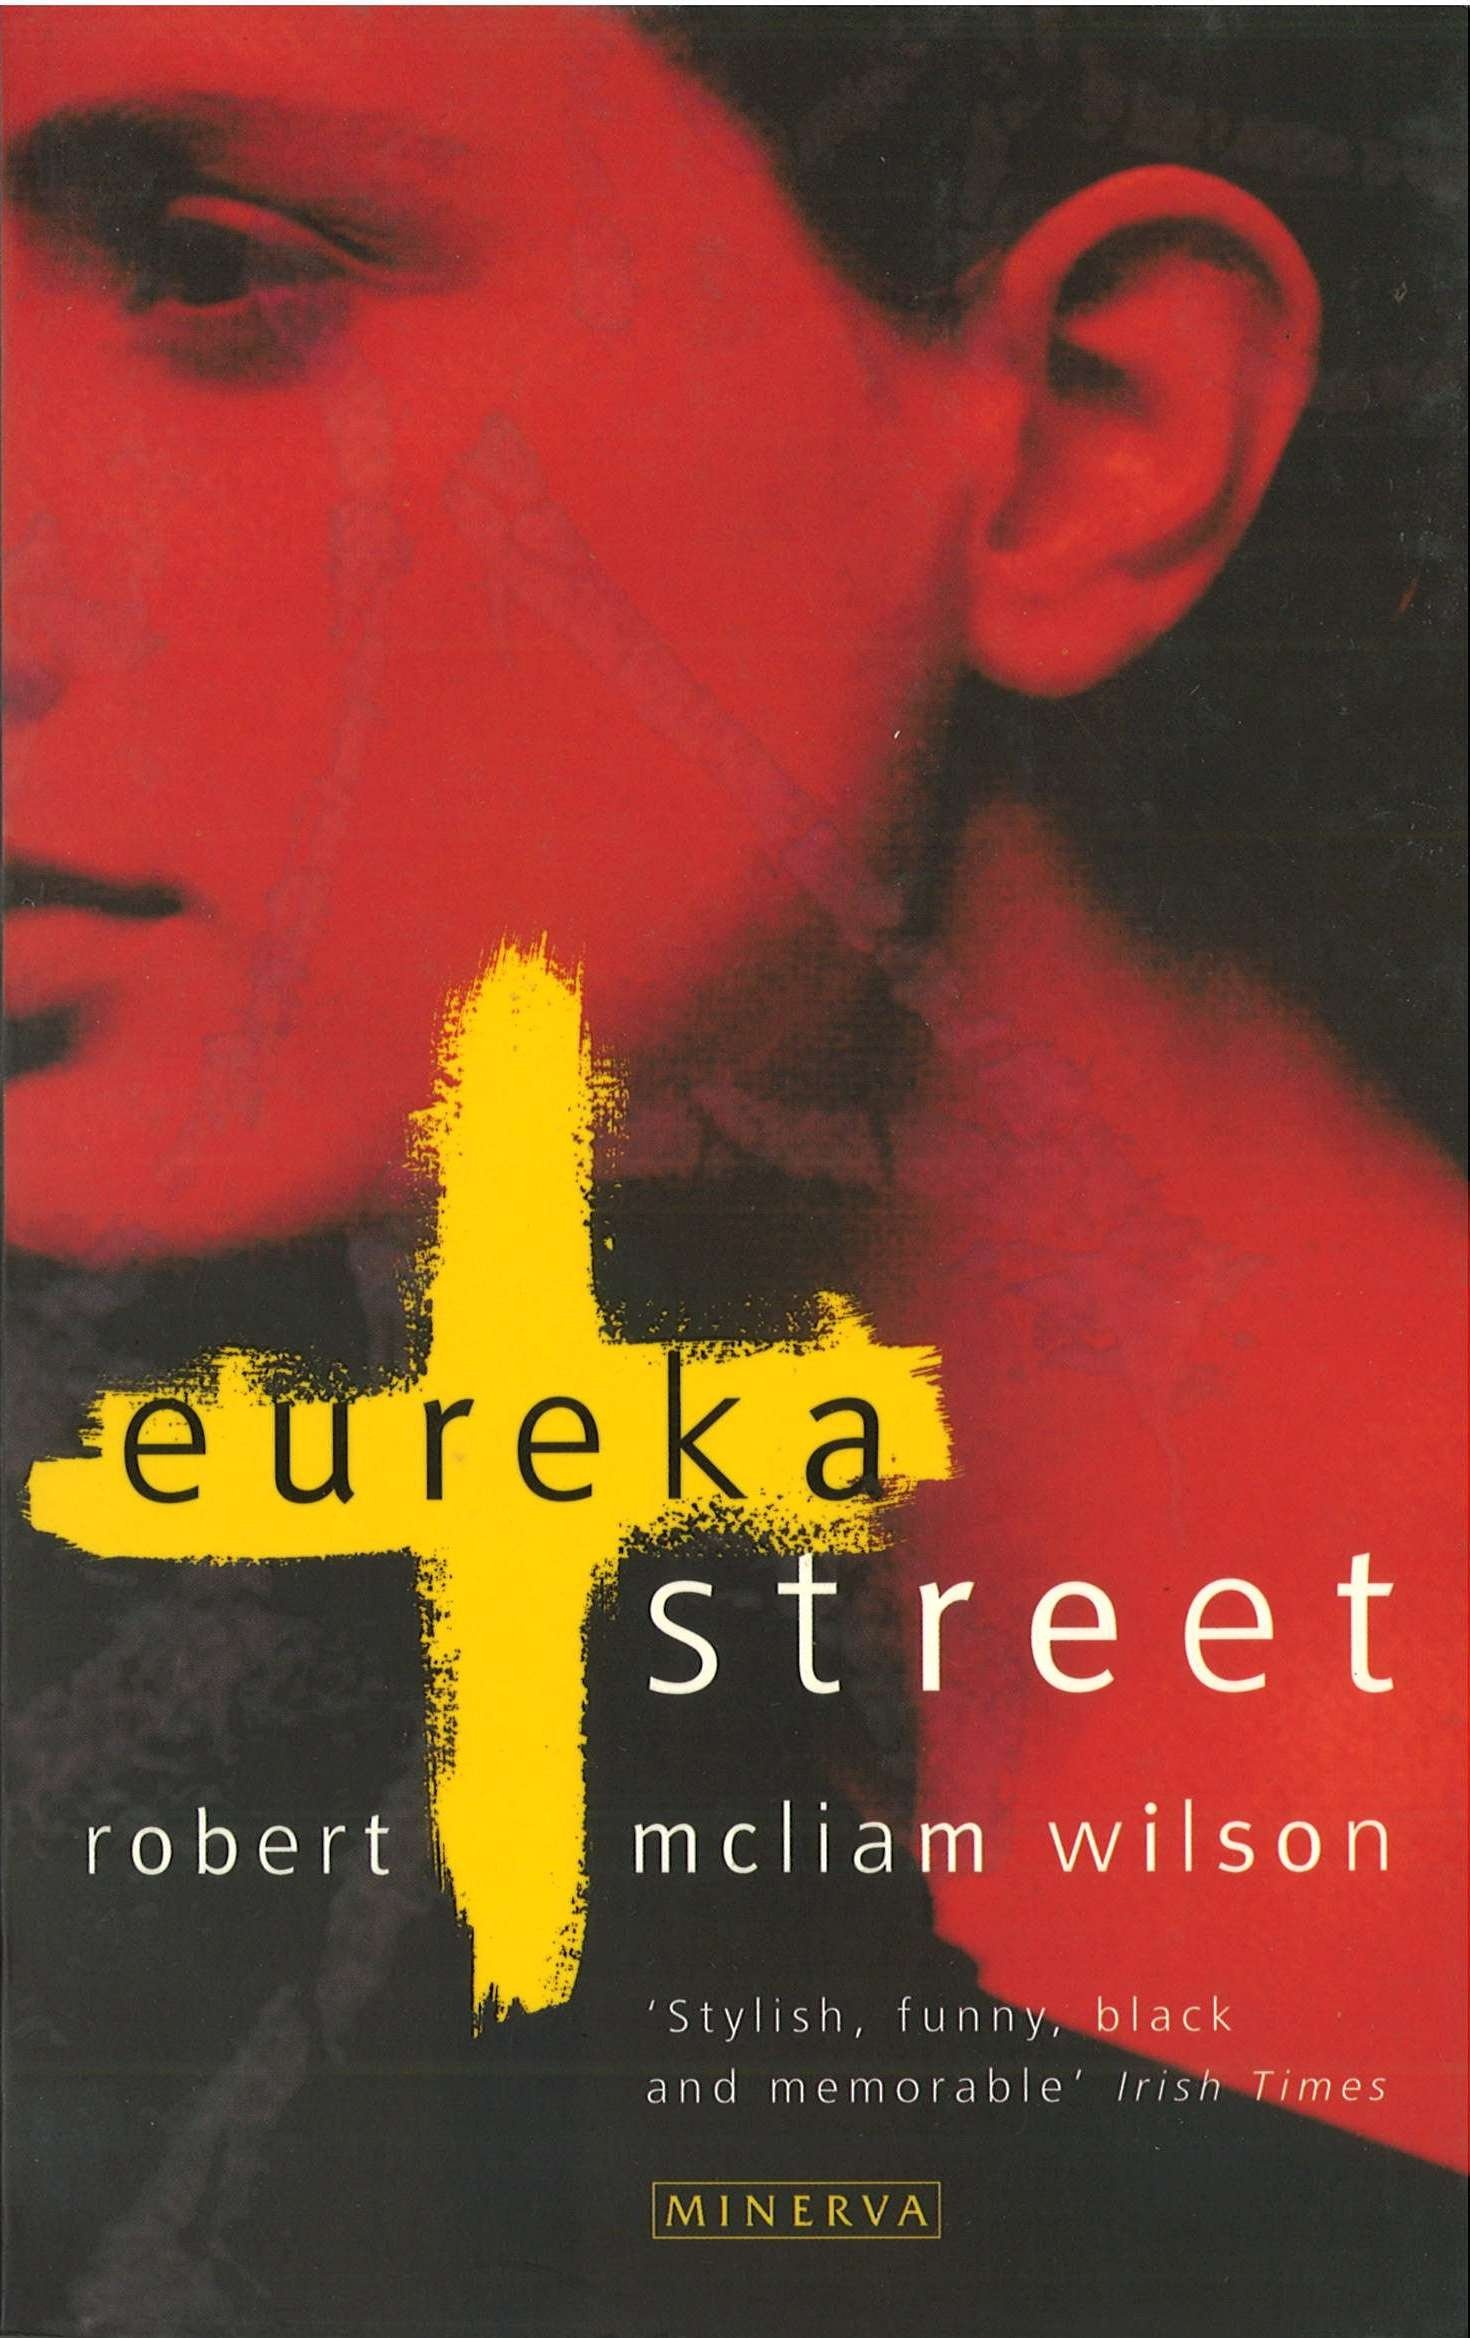 Eureka Street: Amazon.es: Robert McLiam Wilson: Libros en idiomas extranjeros